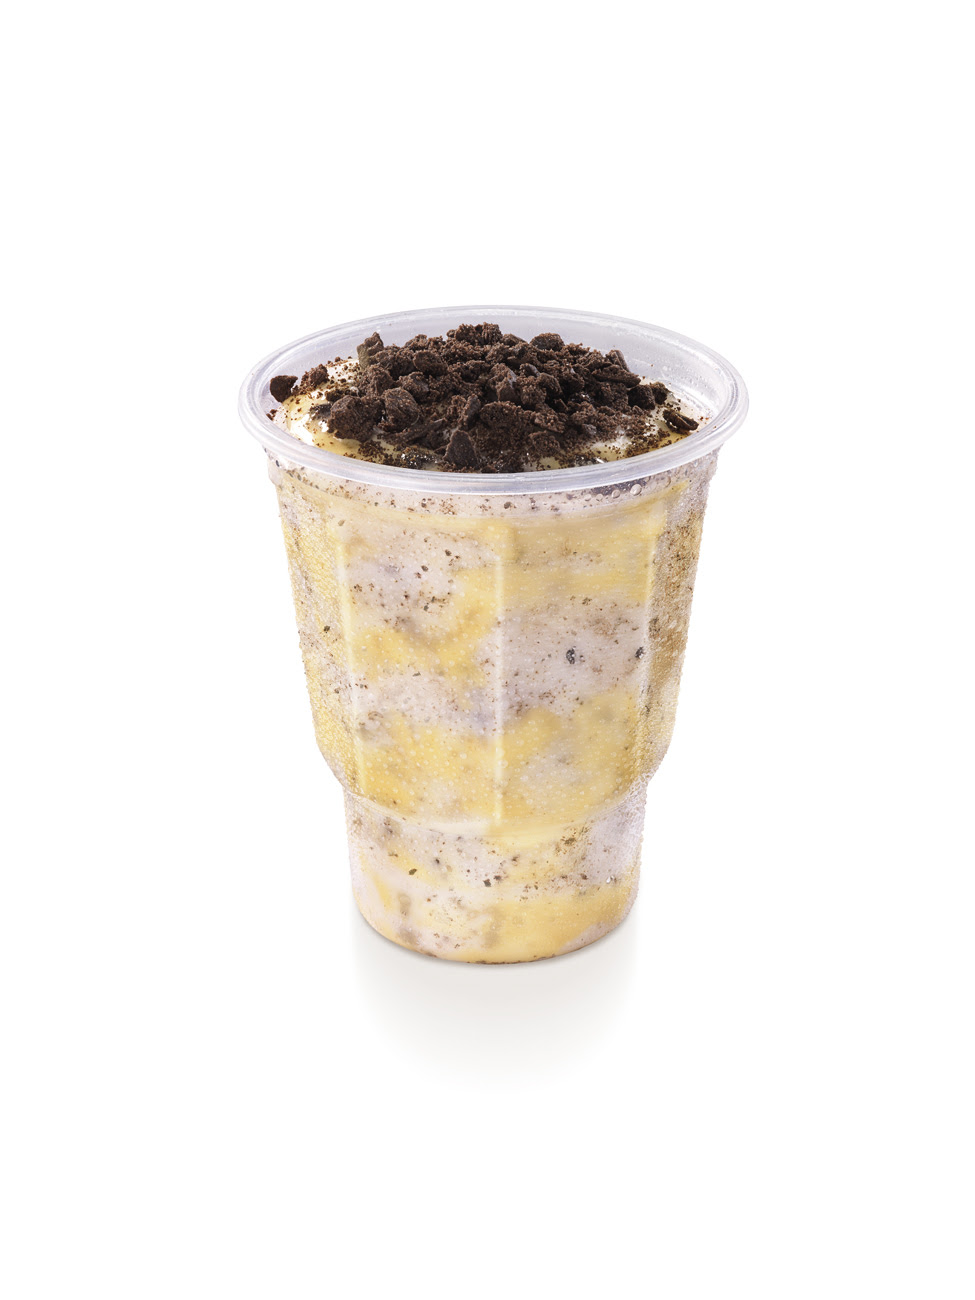 sobremesas-bobs-negresco-twister.jpg